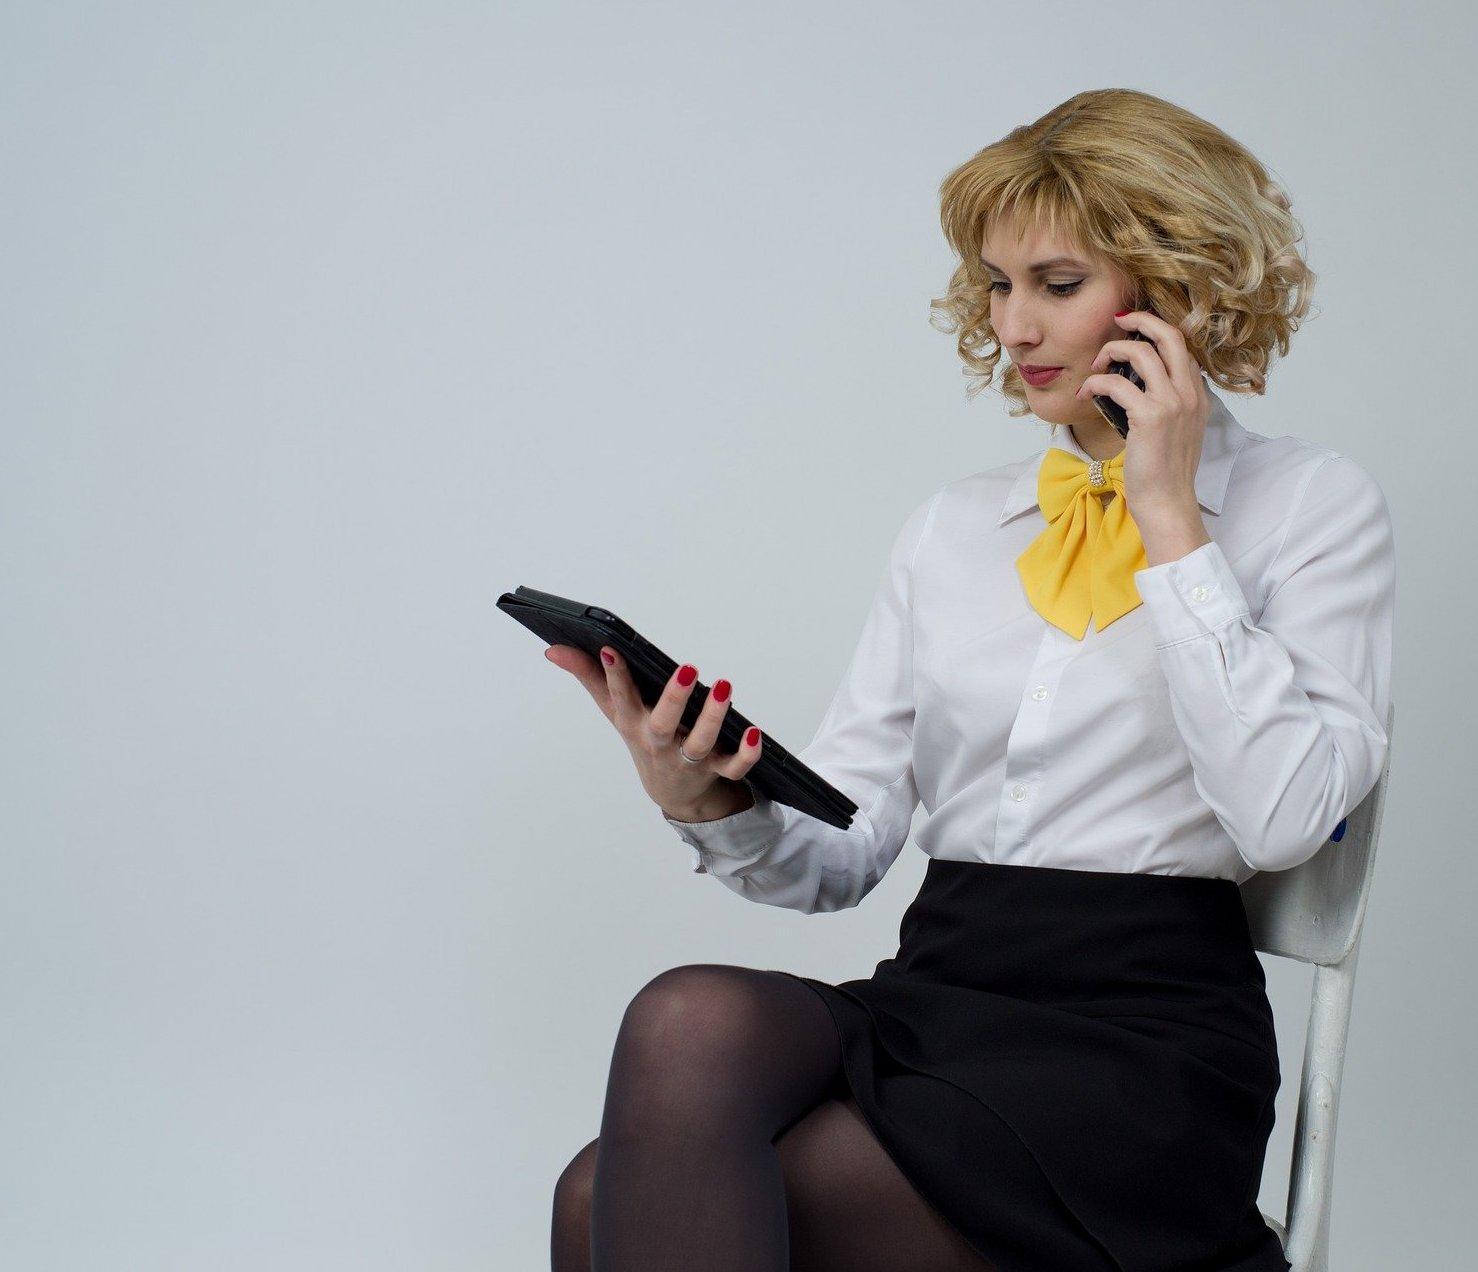 Business woman 2071349 1920 e1488897419606